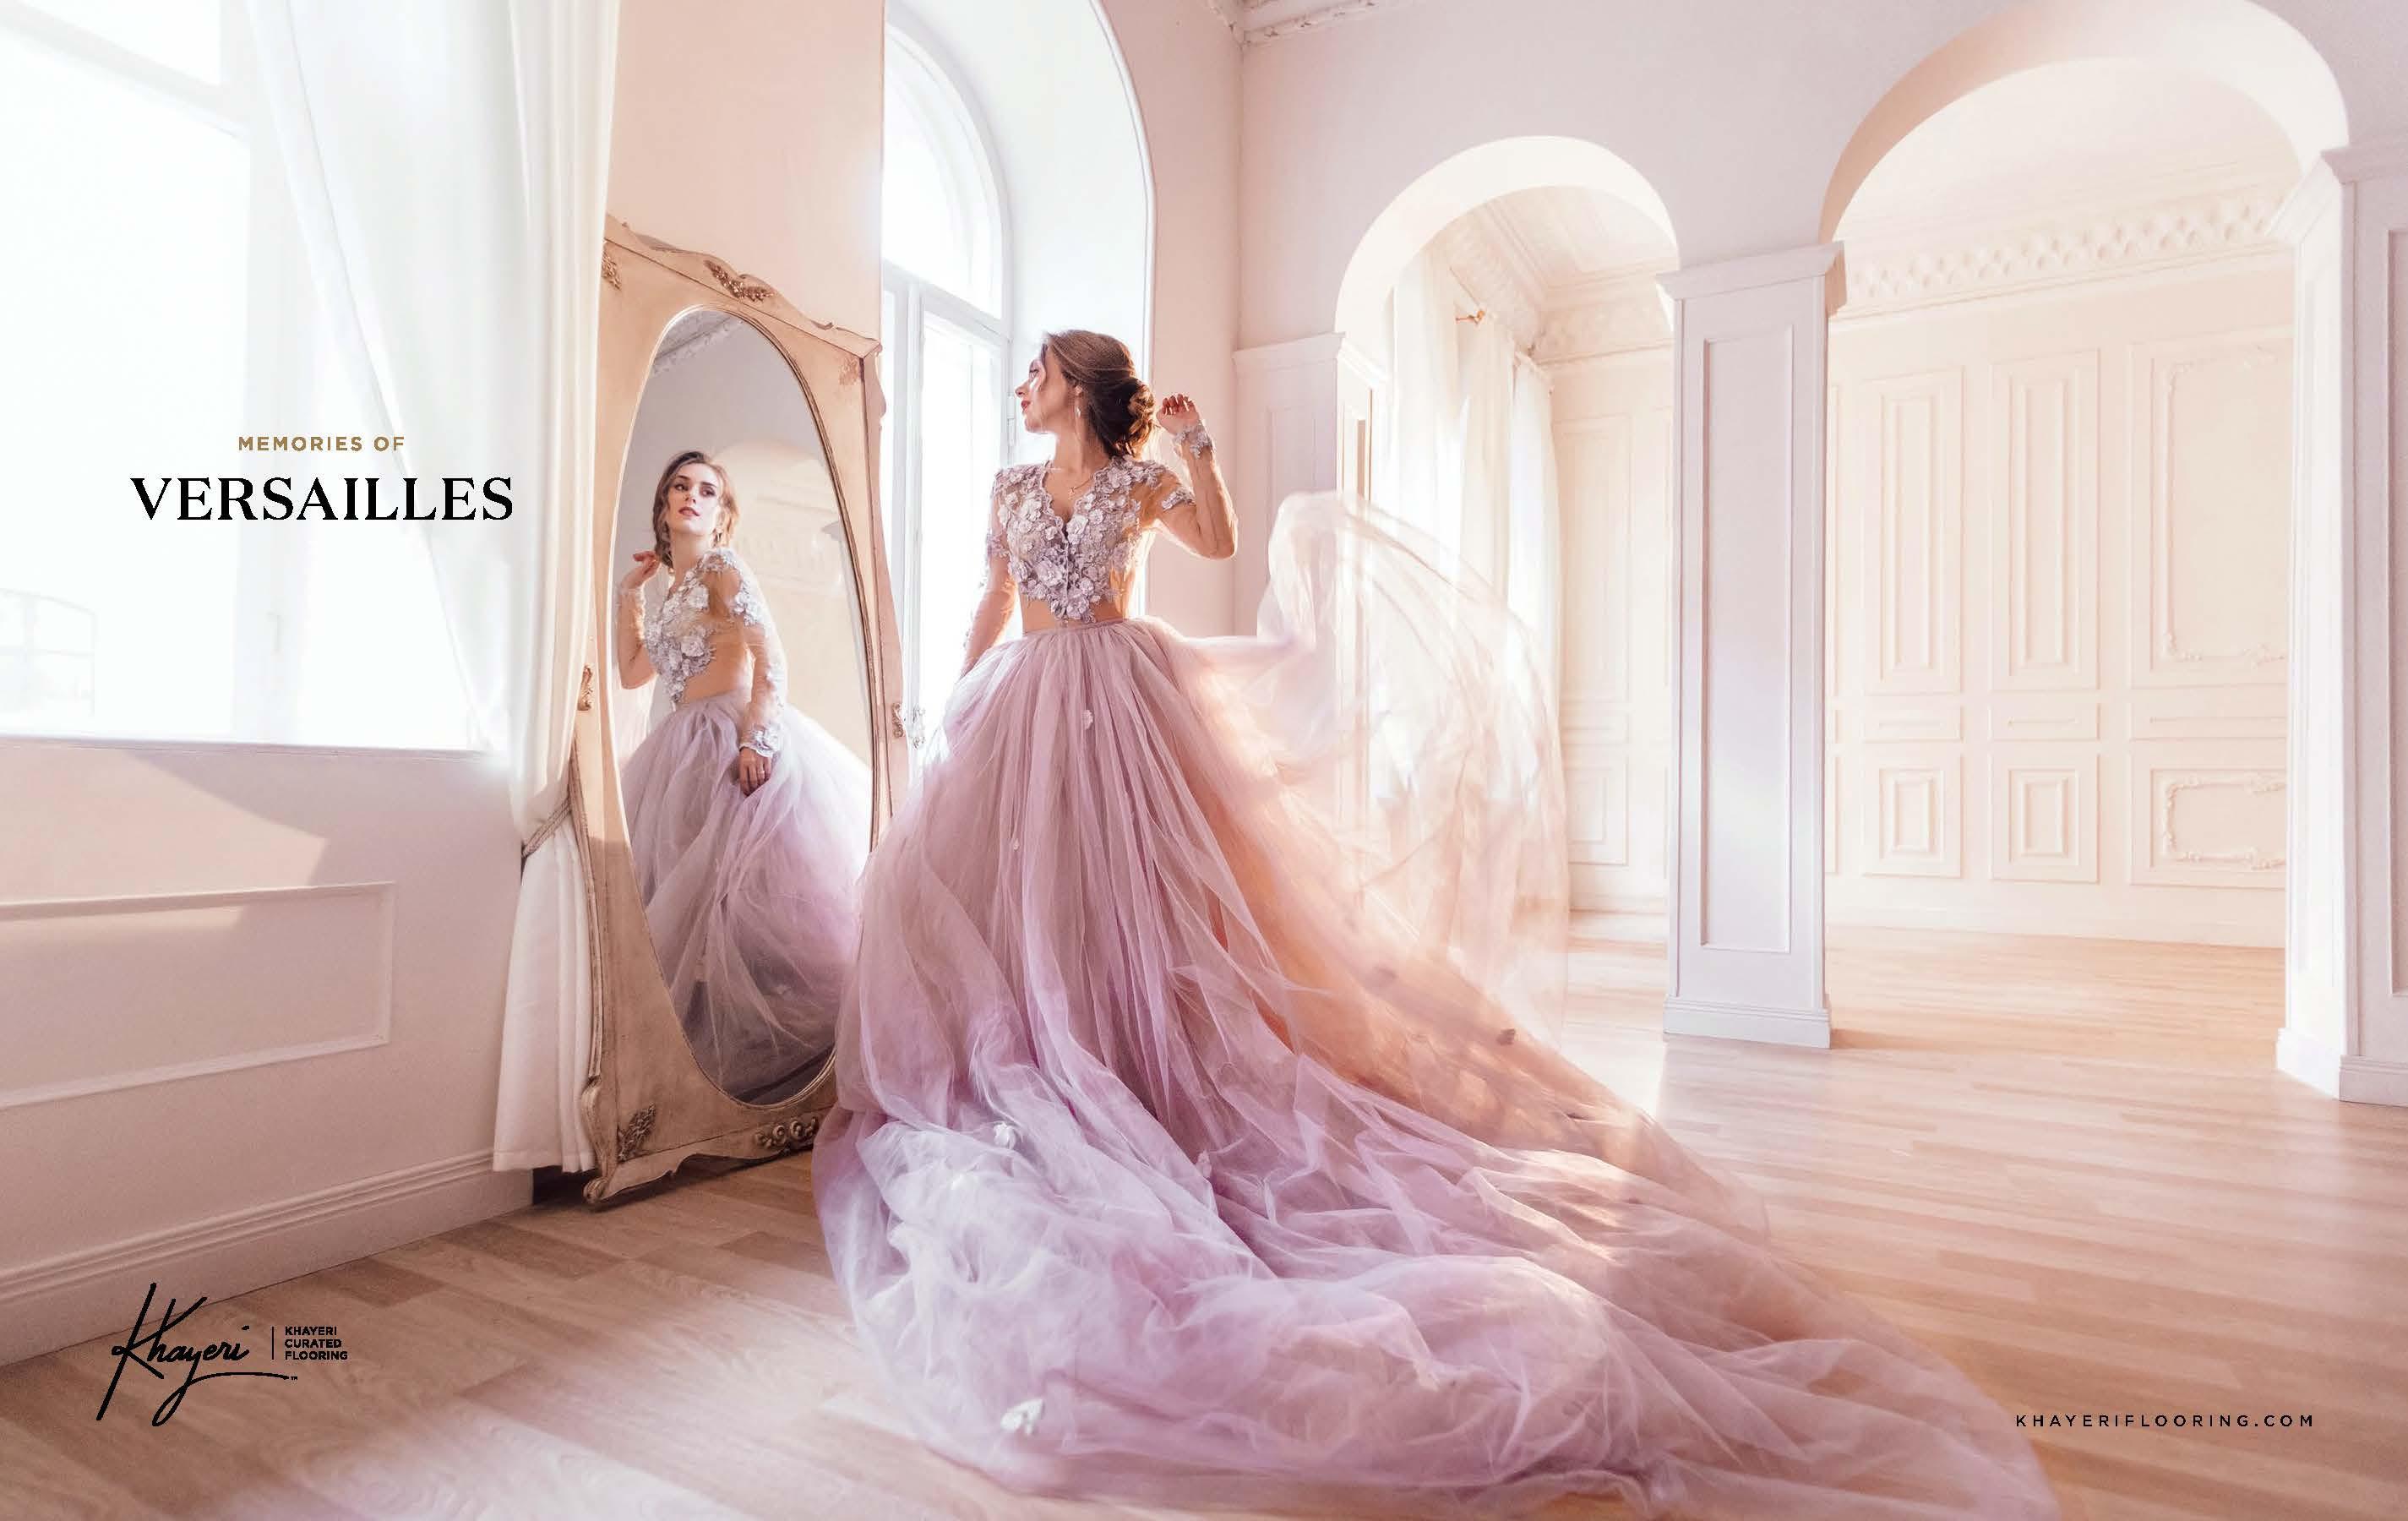 Memories Of Versailles